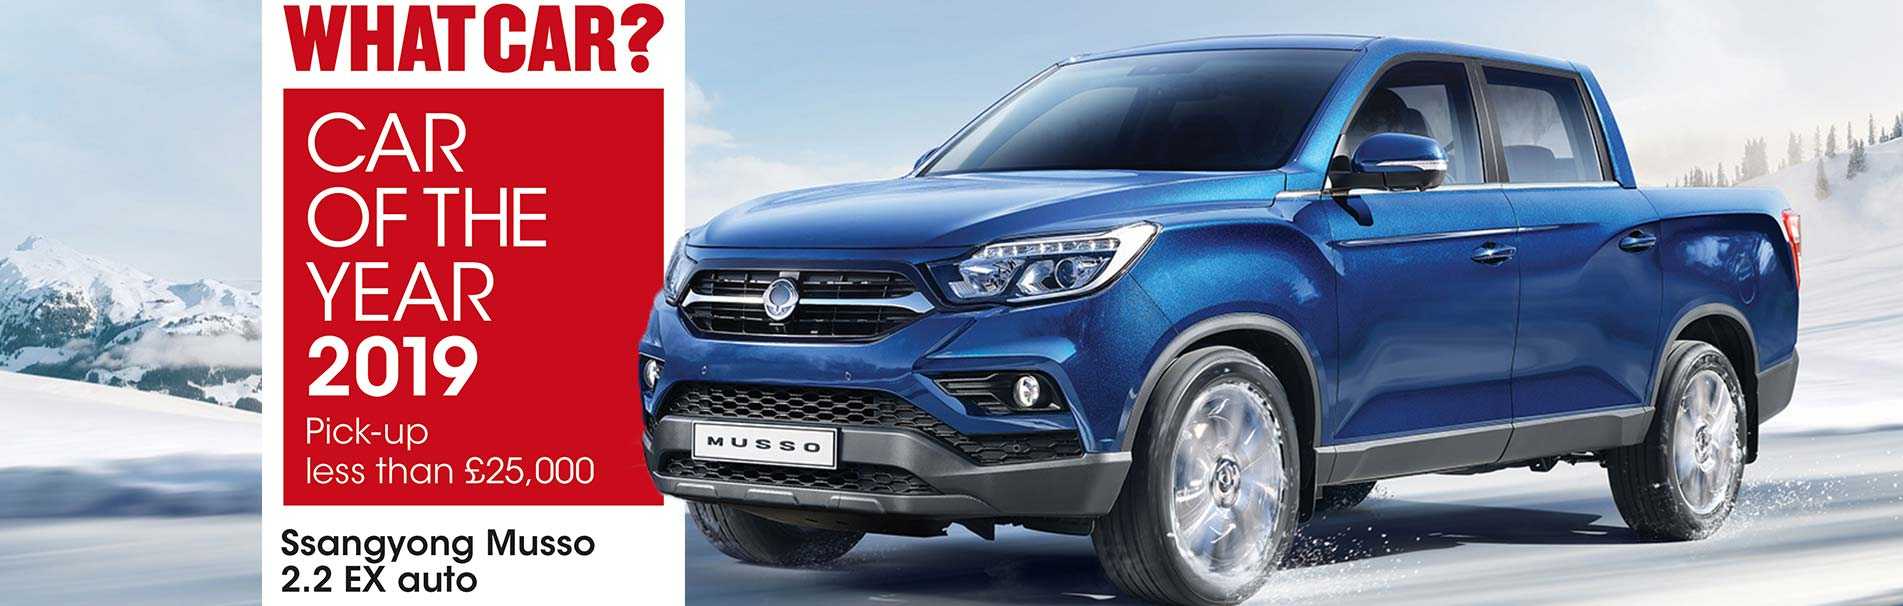 ssangyong-musso-wins-best-pickup-under 25000-sli